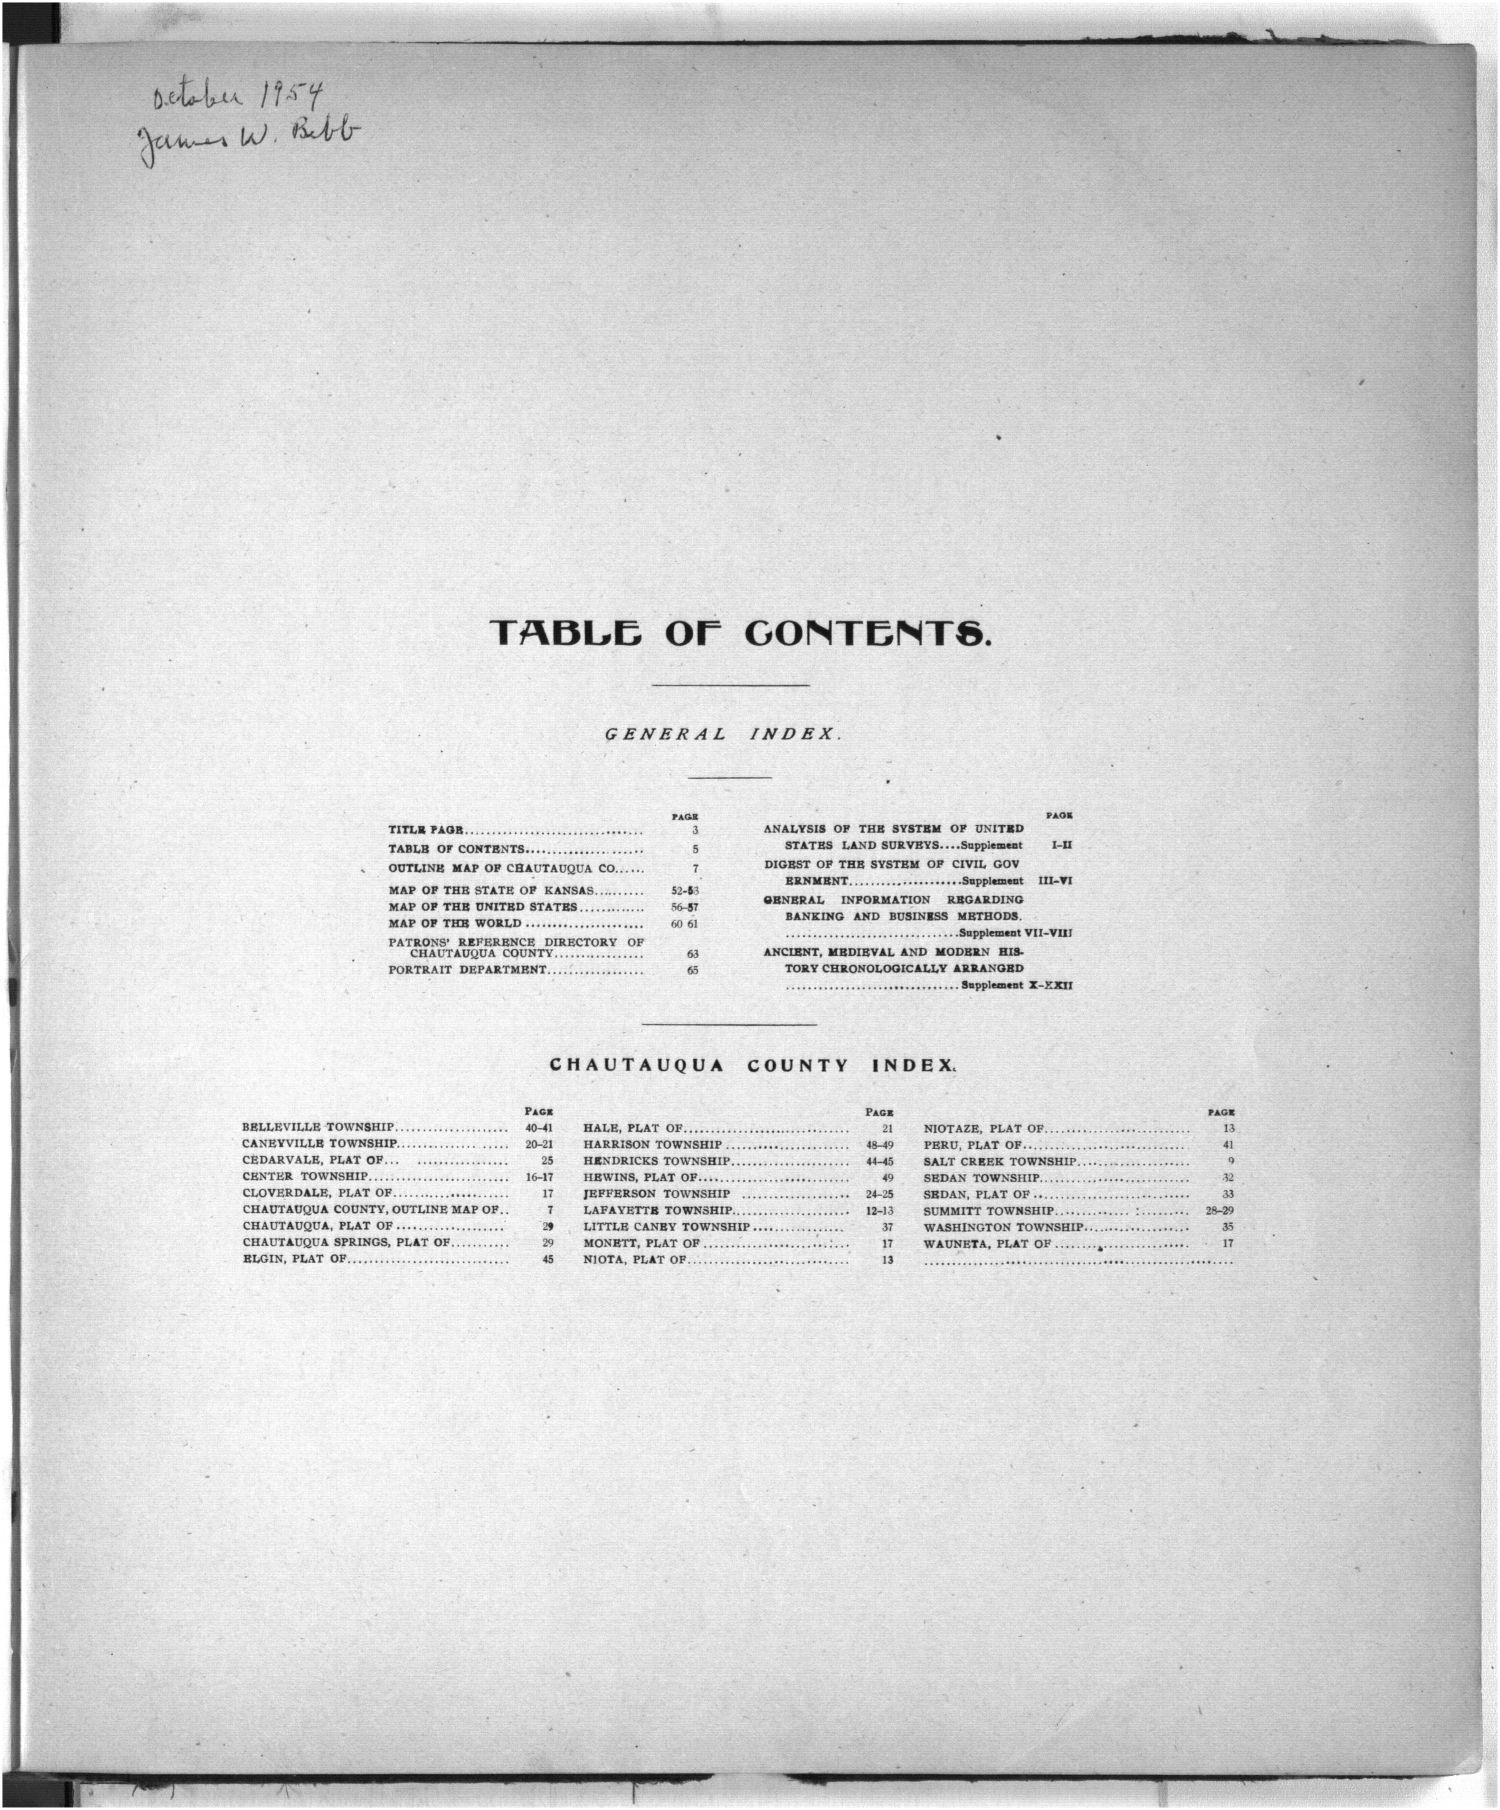 Standard atlas of Chautauqua County, Kansas - Table of Contents